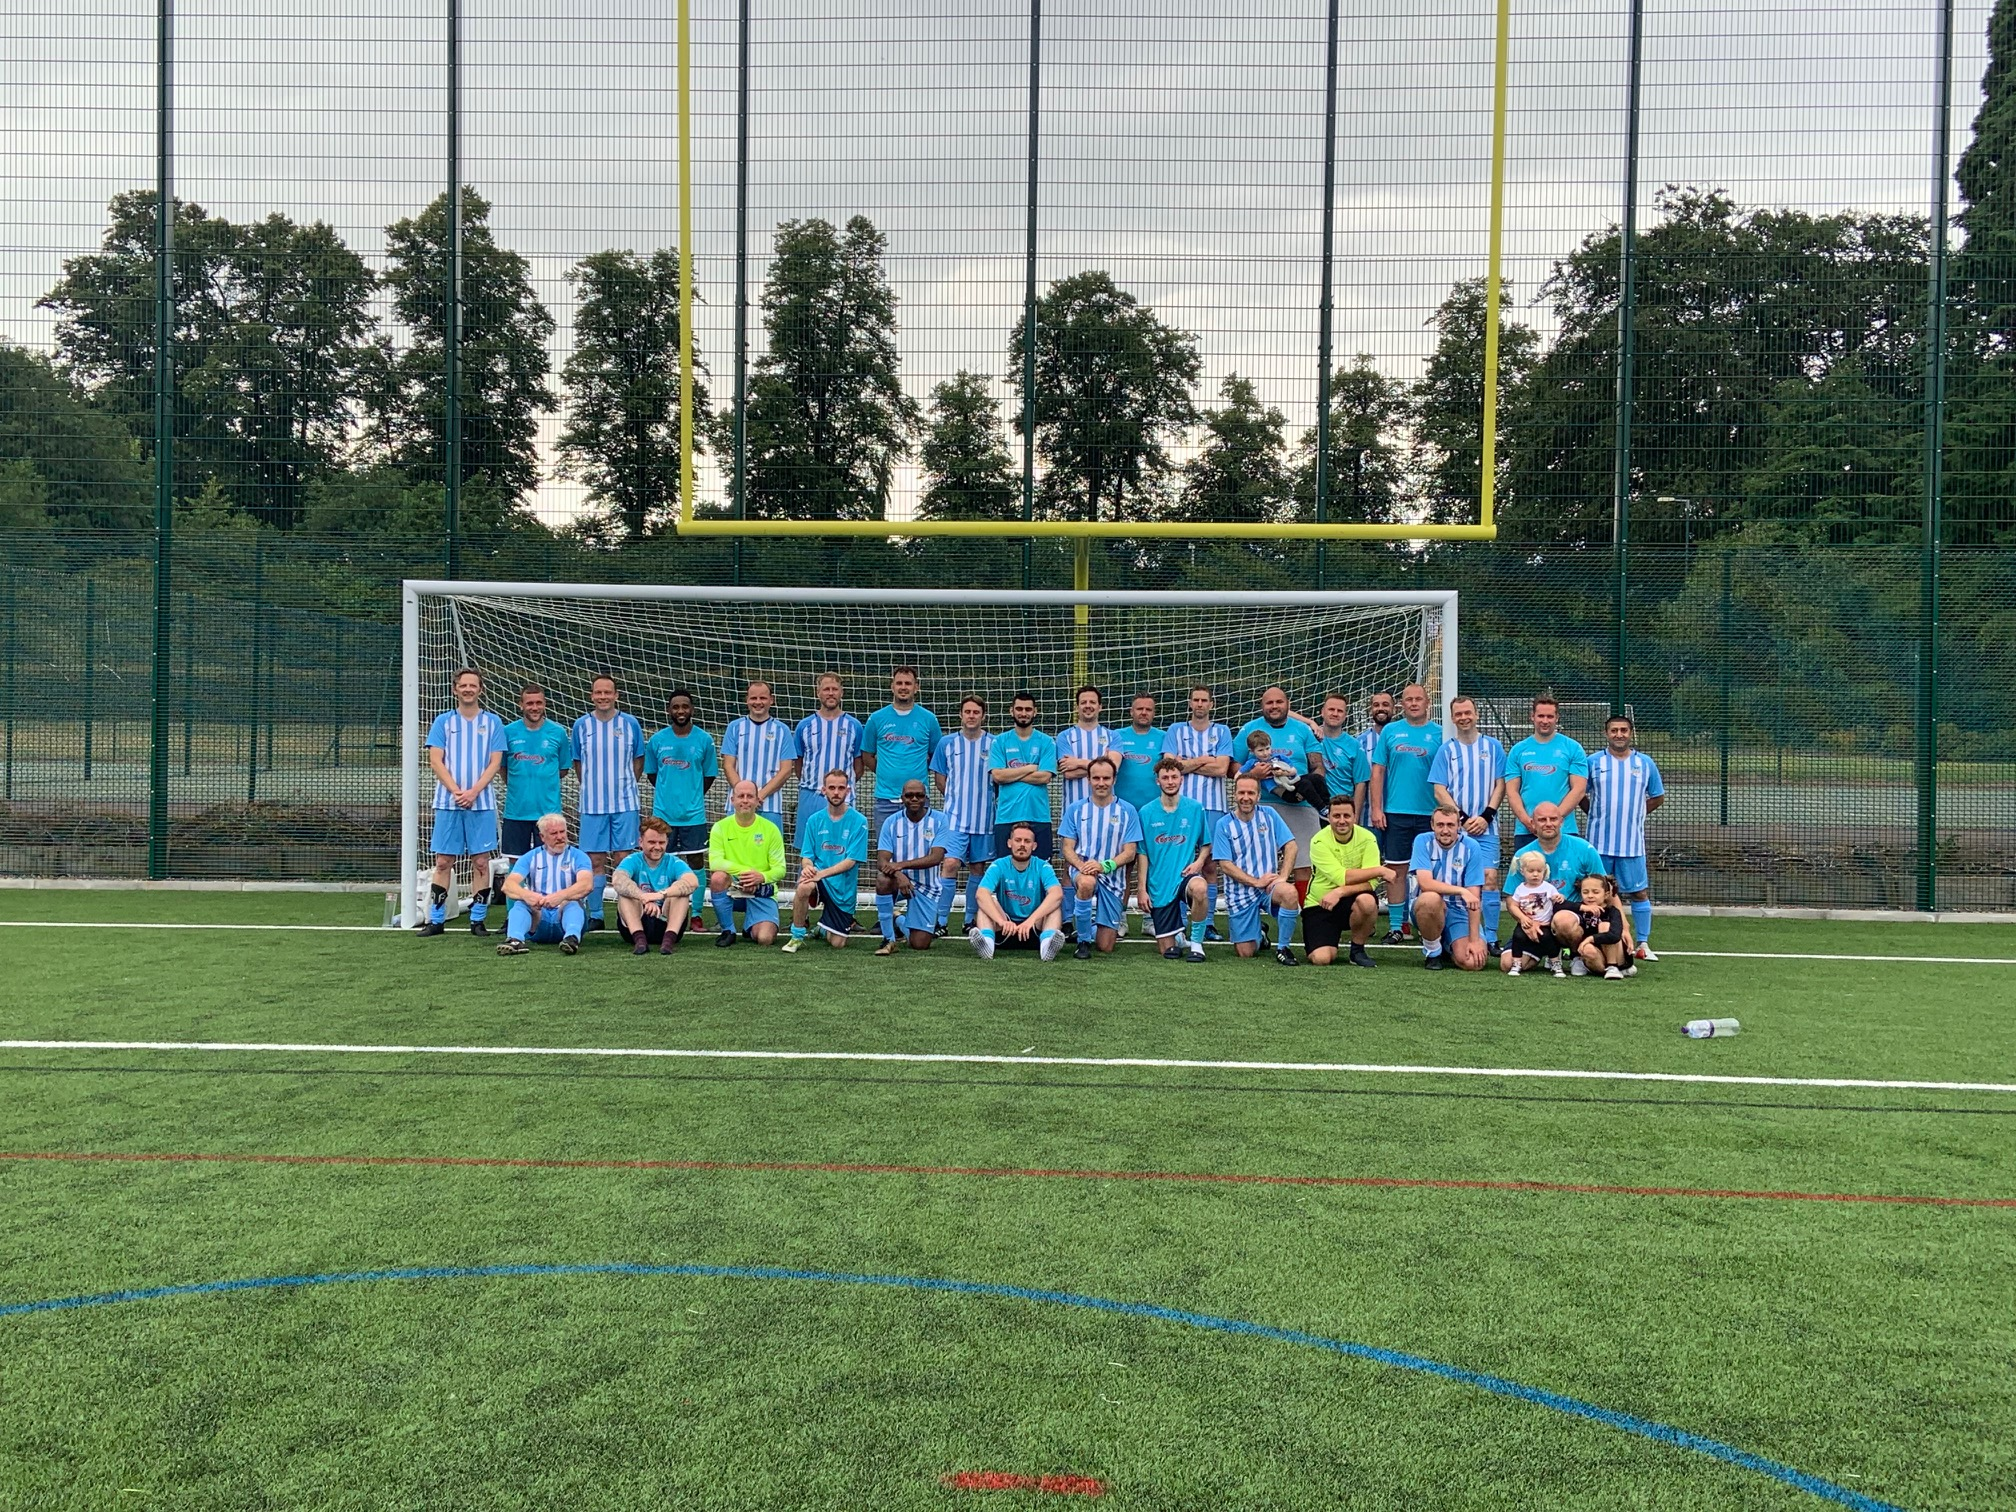 Nottingham Property Group Kicks Off Community Spirit At Football Fundraiser